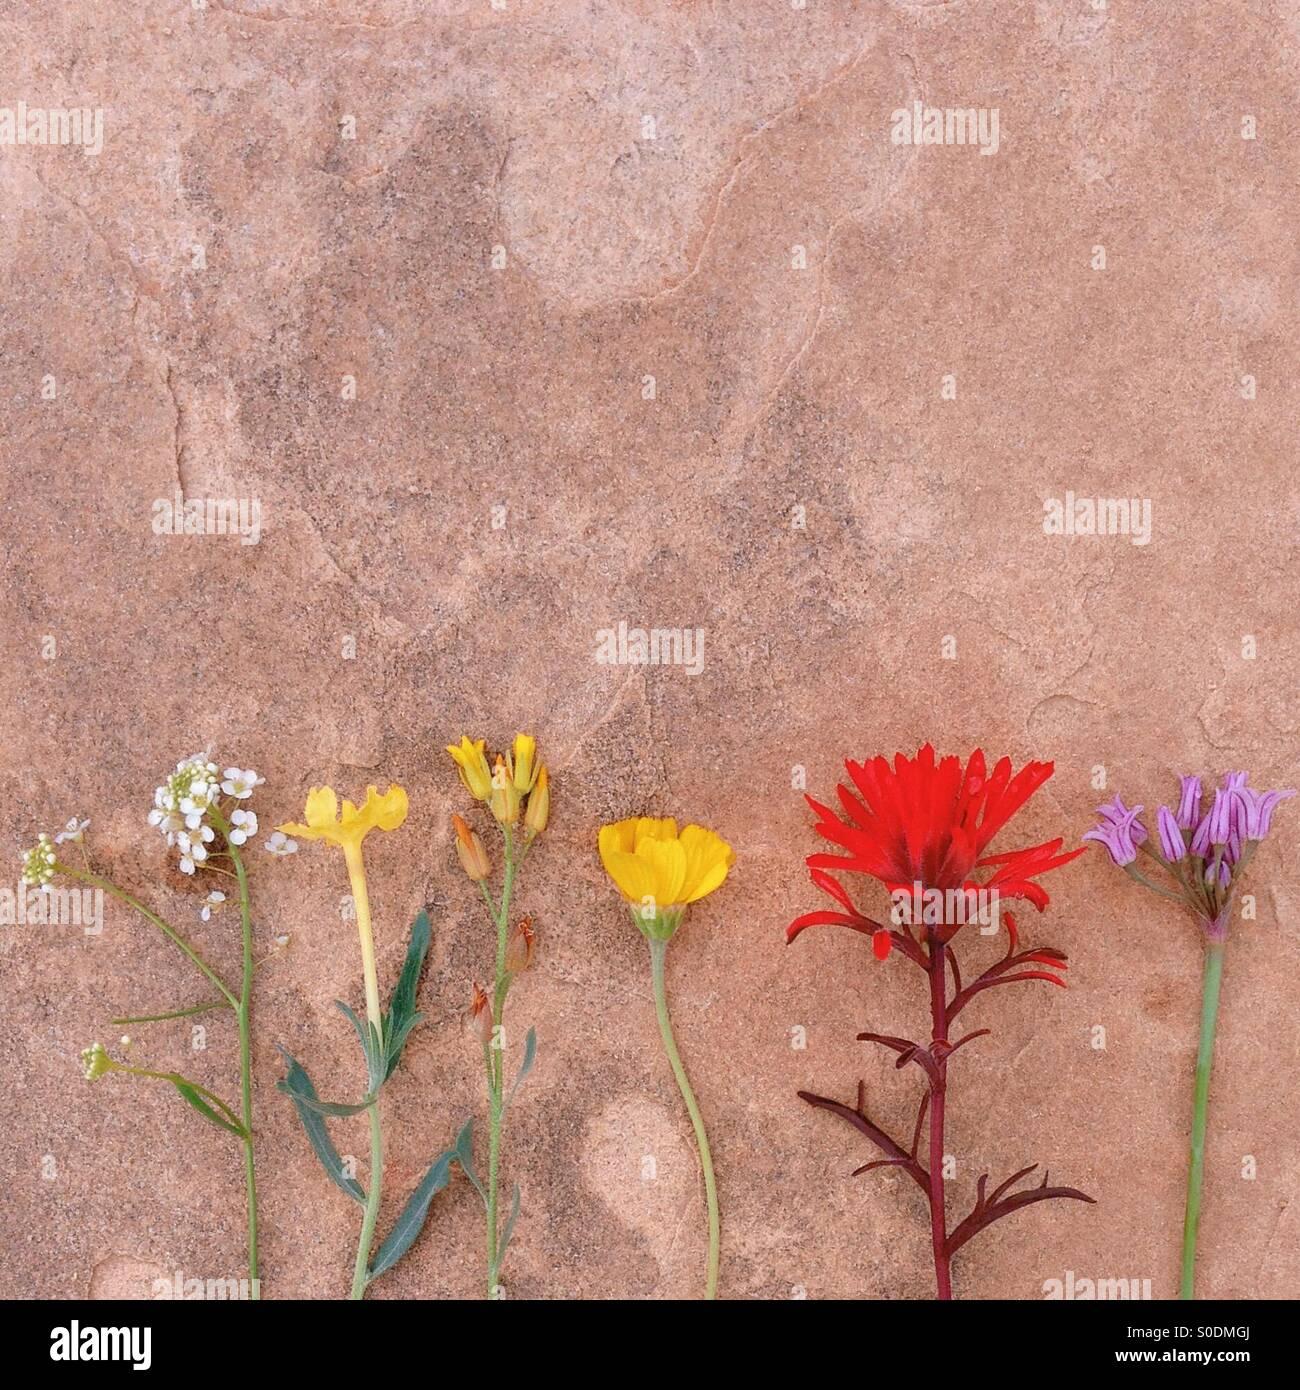 Flora der Wüste Stockbild